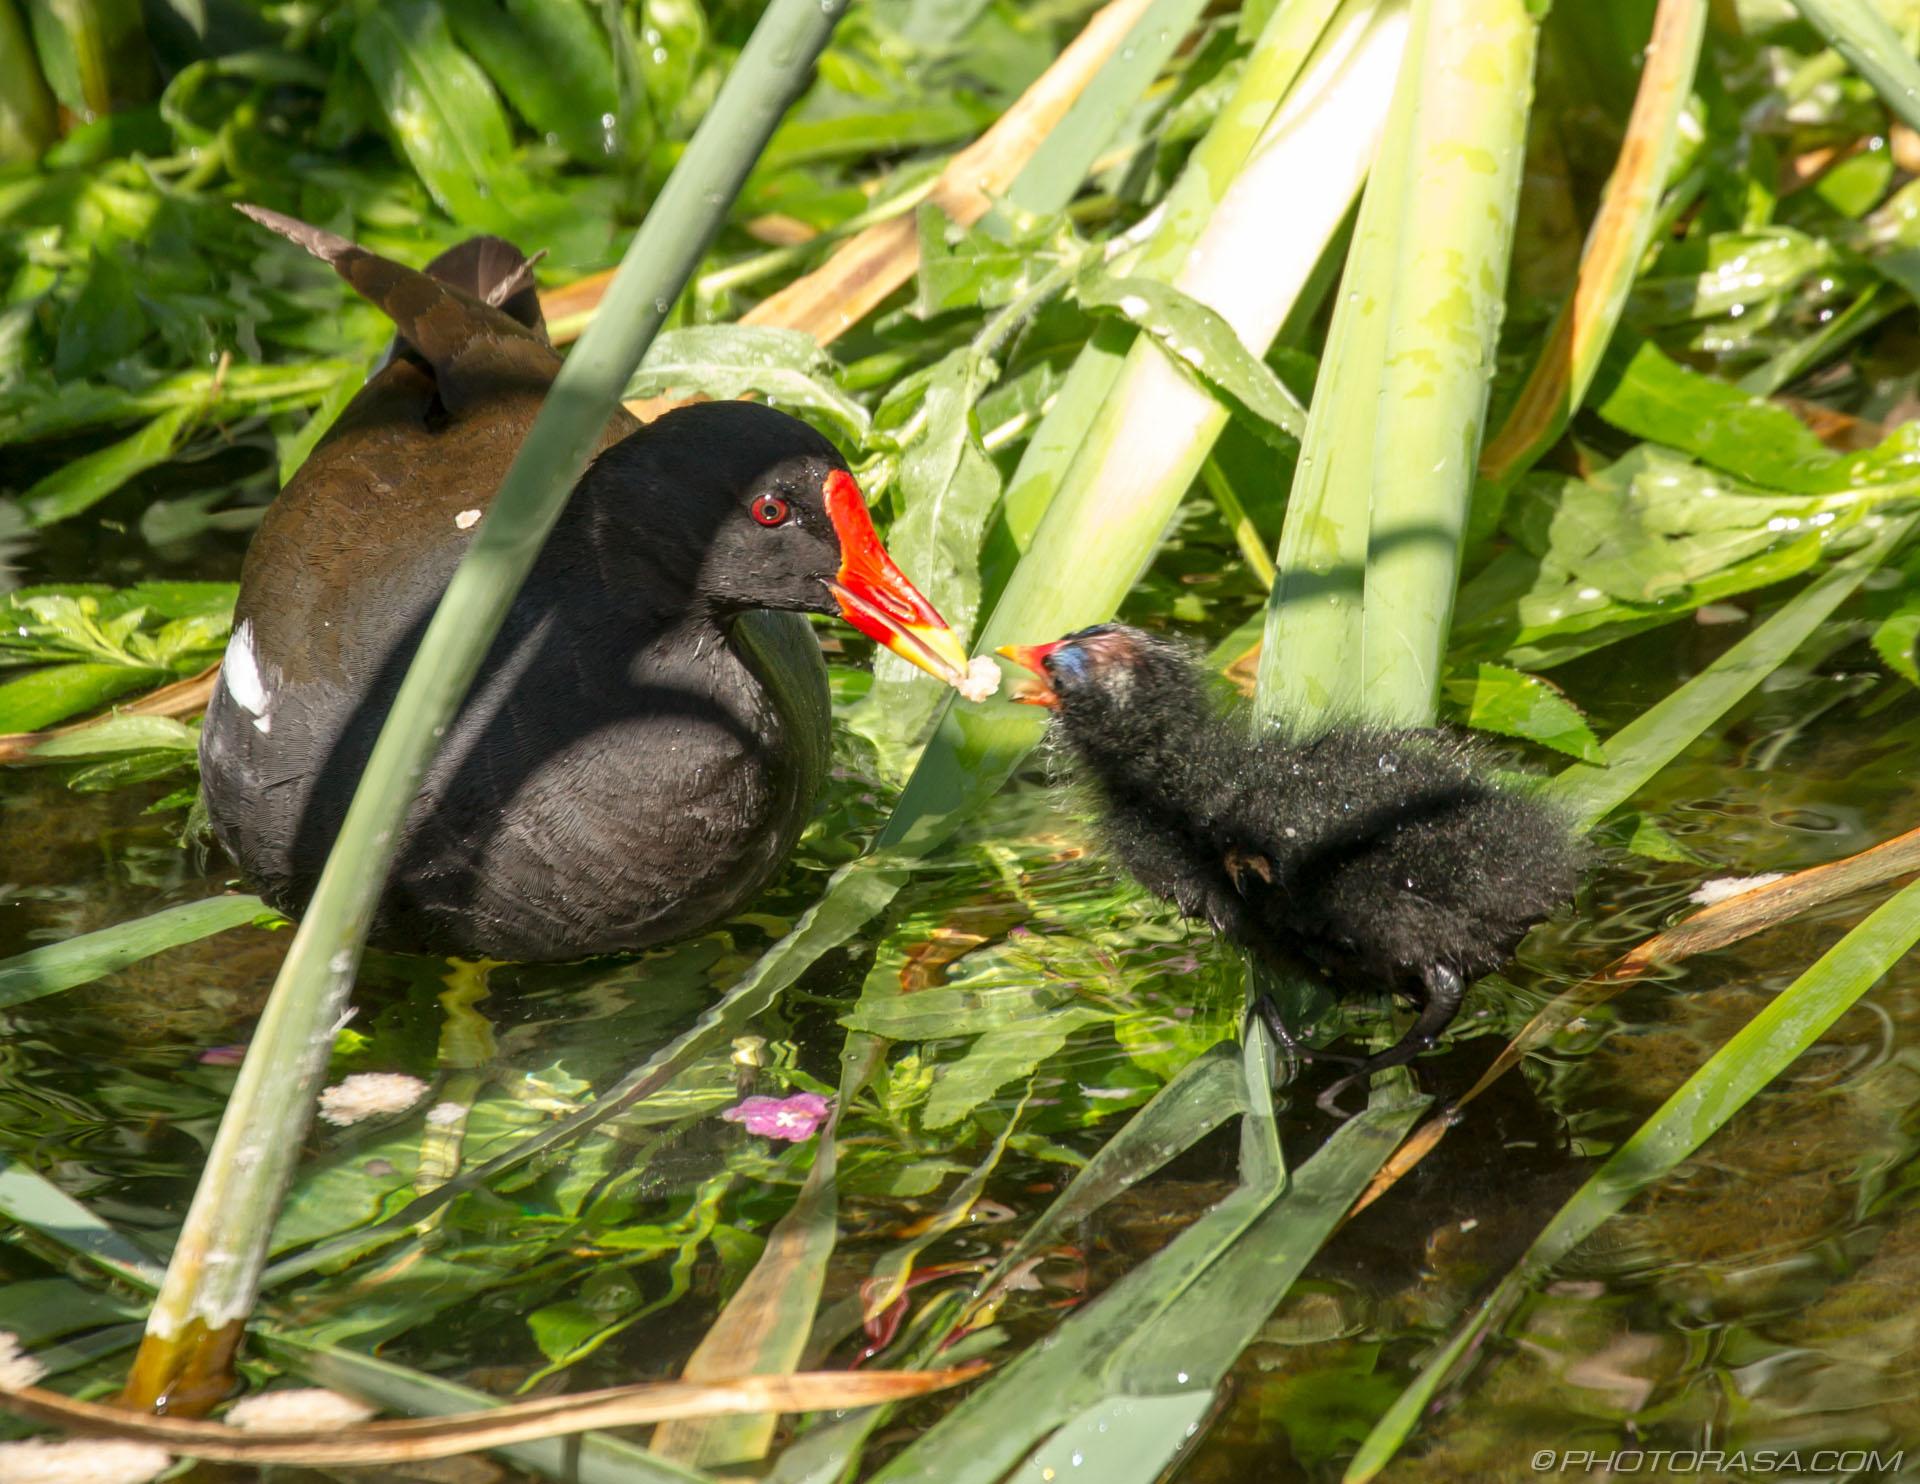 https://photorasa.com/baby-moorhen-and-mother/mother-and-chick-beak-to-beak/